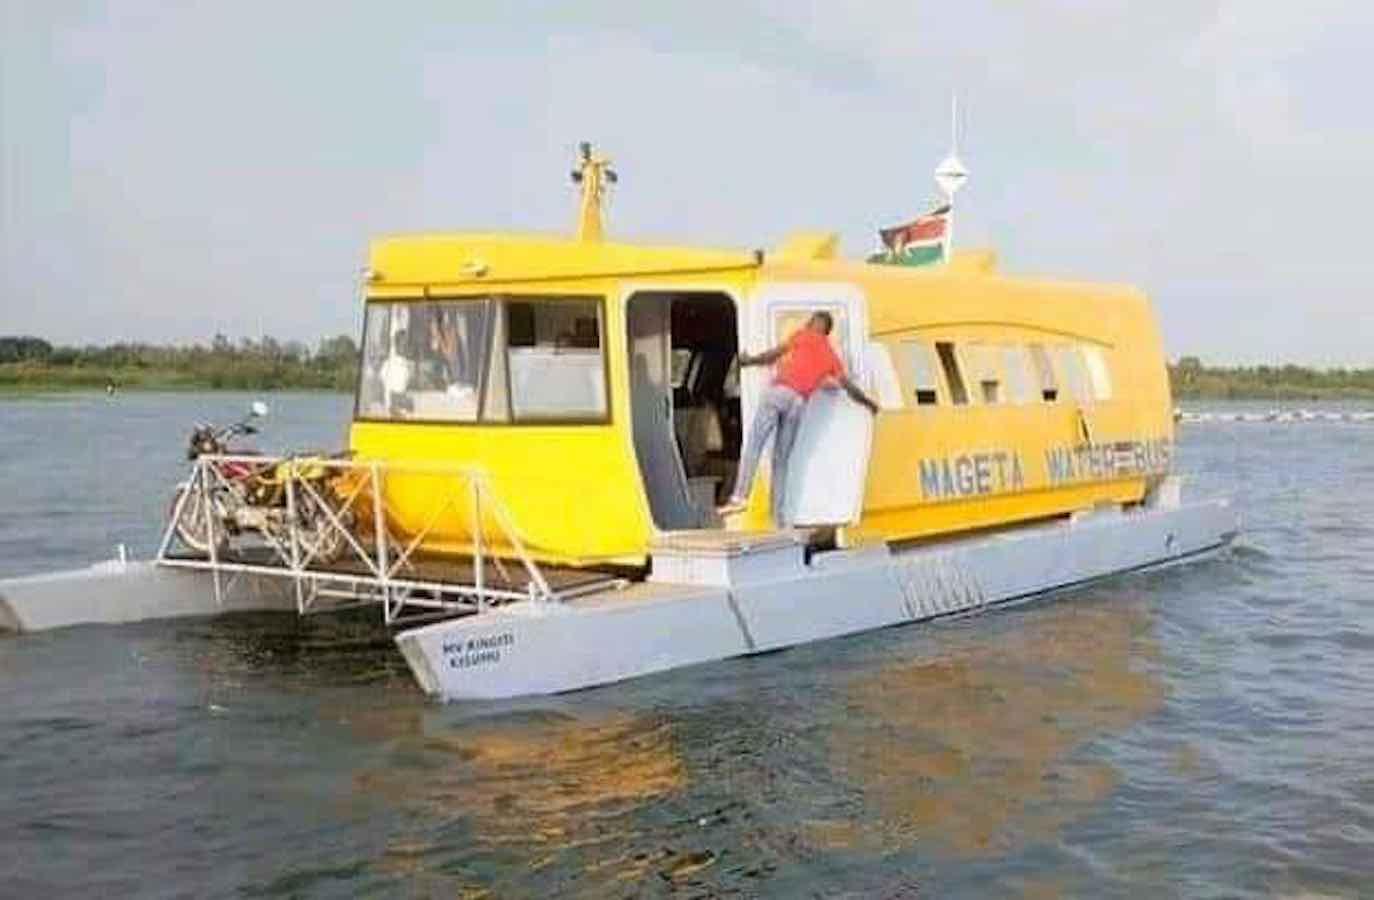 Water boat aka ferry capsizes in Lake Victoria